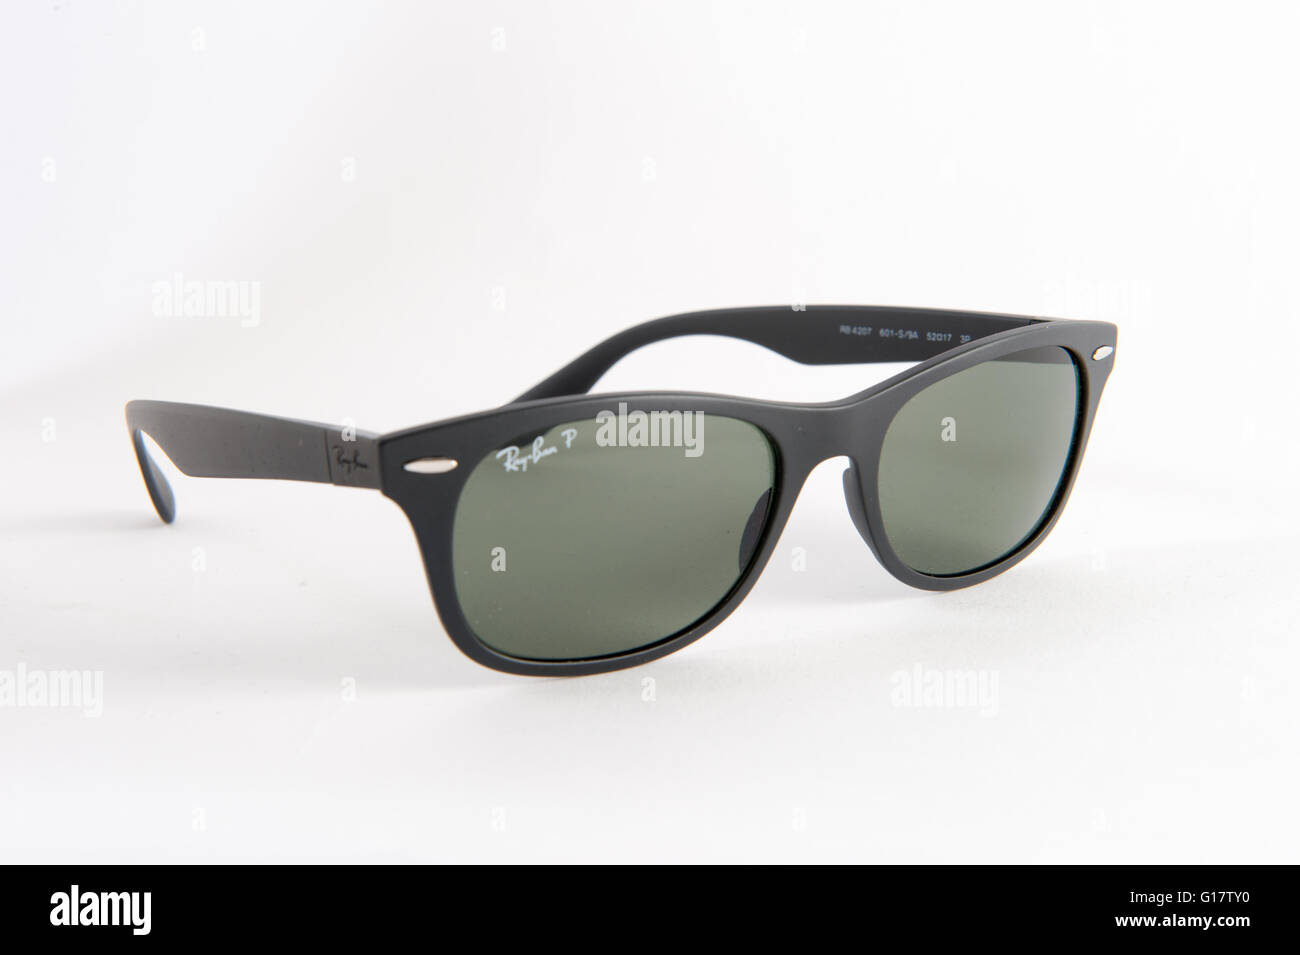 Wayfarer Sunglasses Imágenes De Stock & Wayfarer Sunglasses Fotos De ...